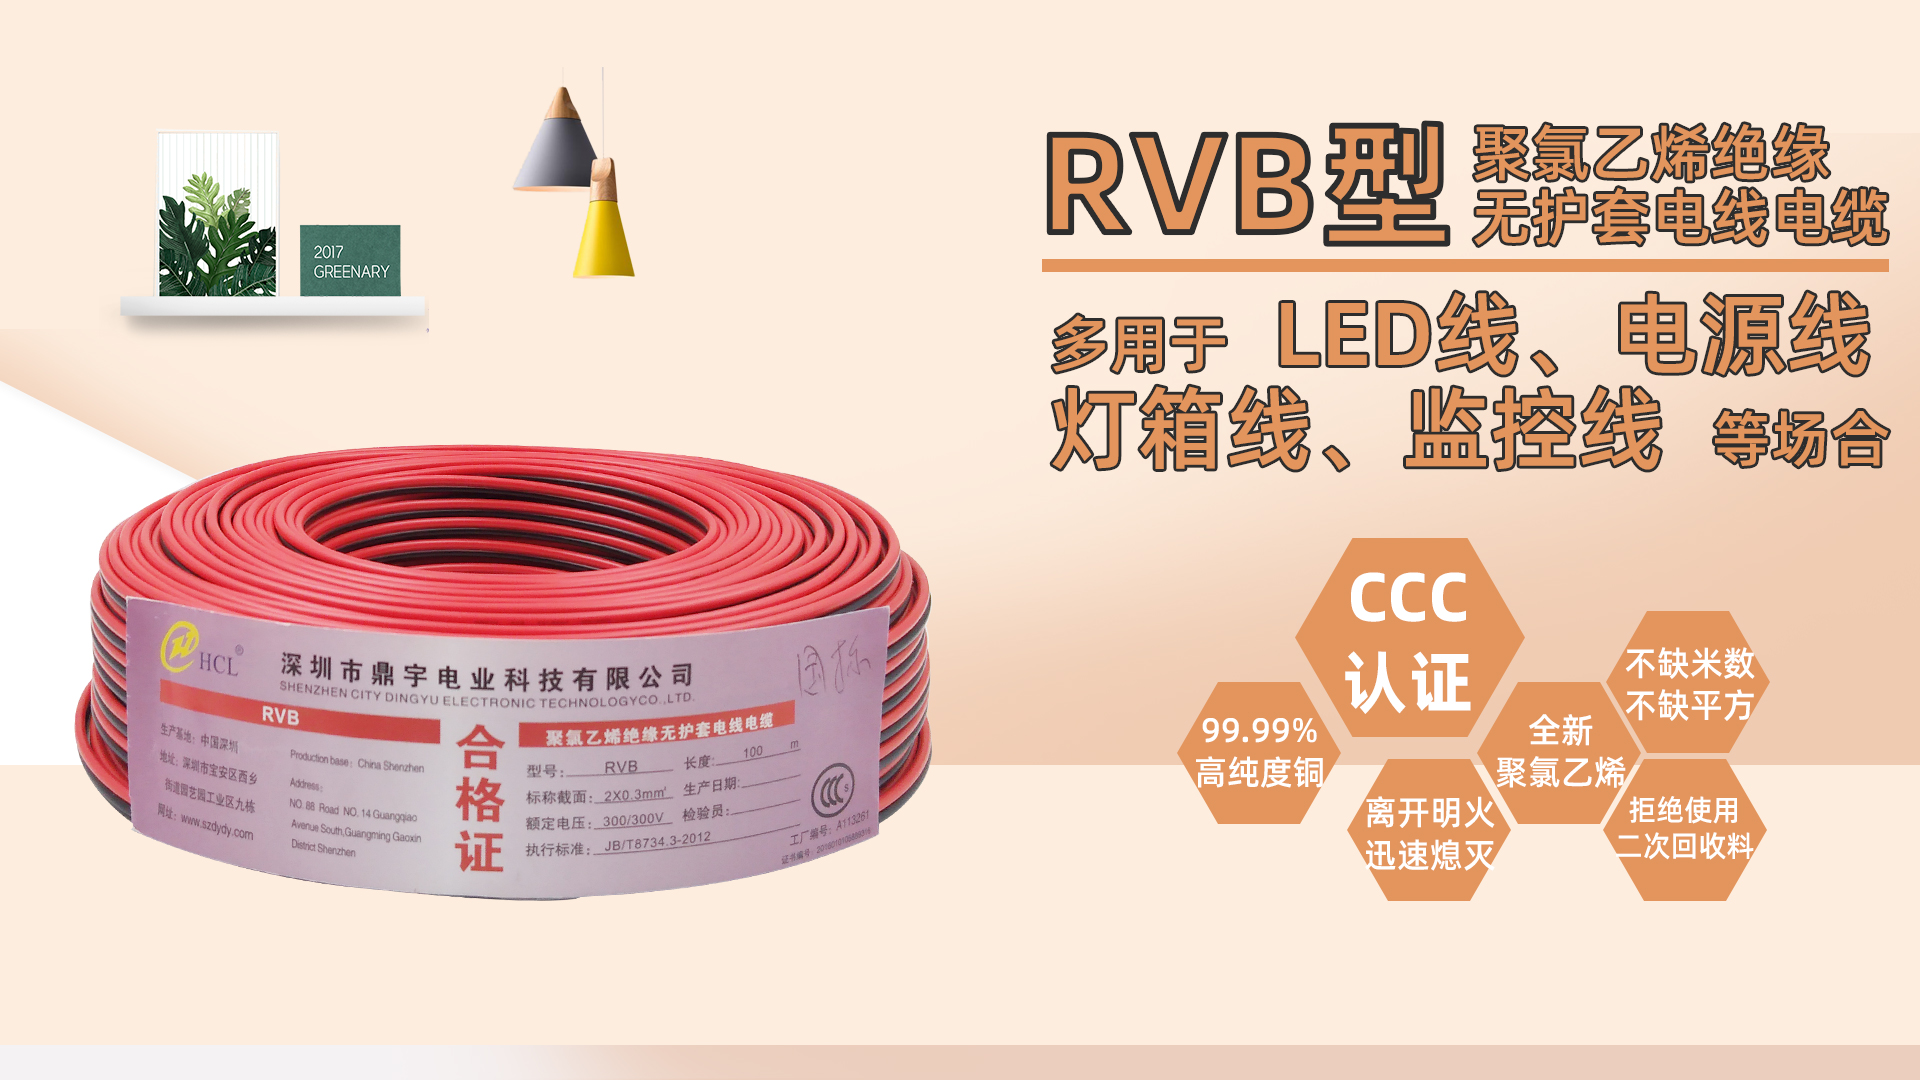 RVB扁形平衡红黑线